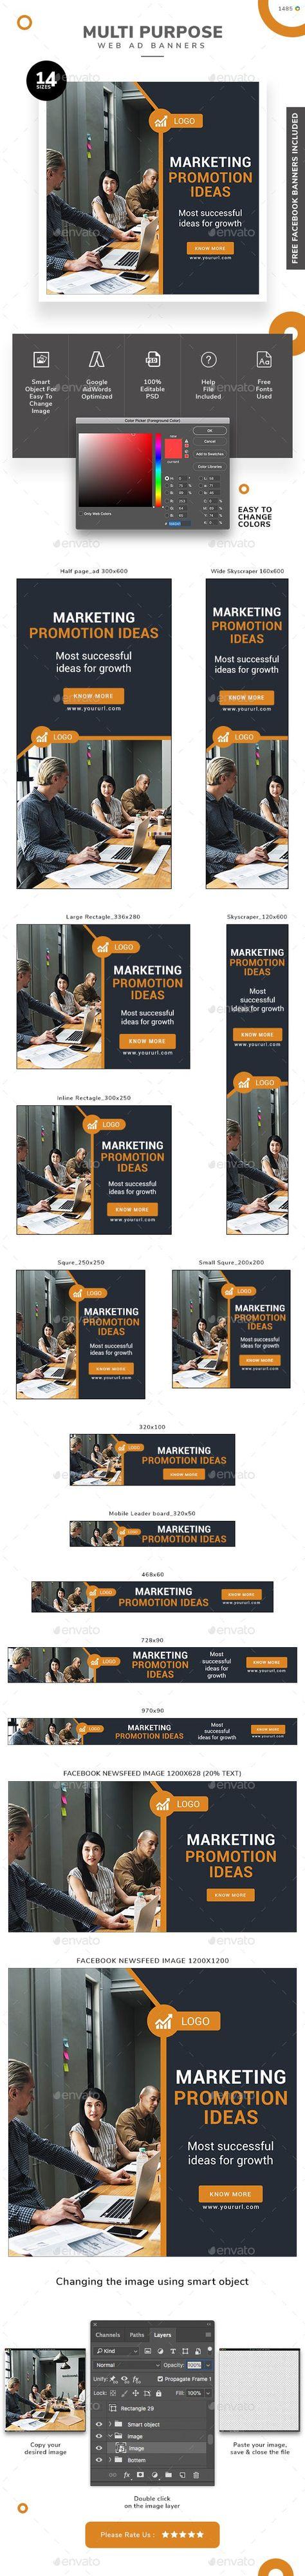 Multi Purpose Web Banner Set